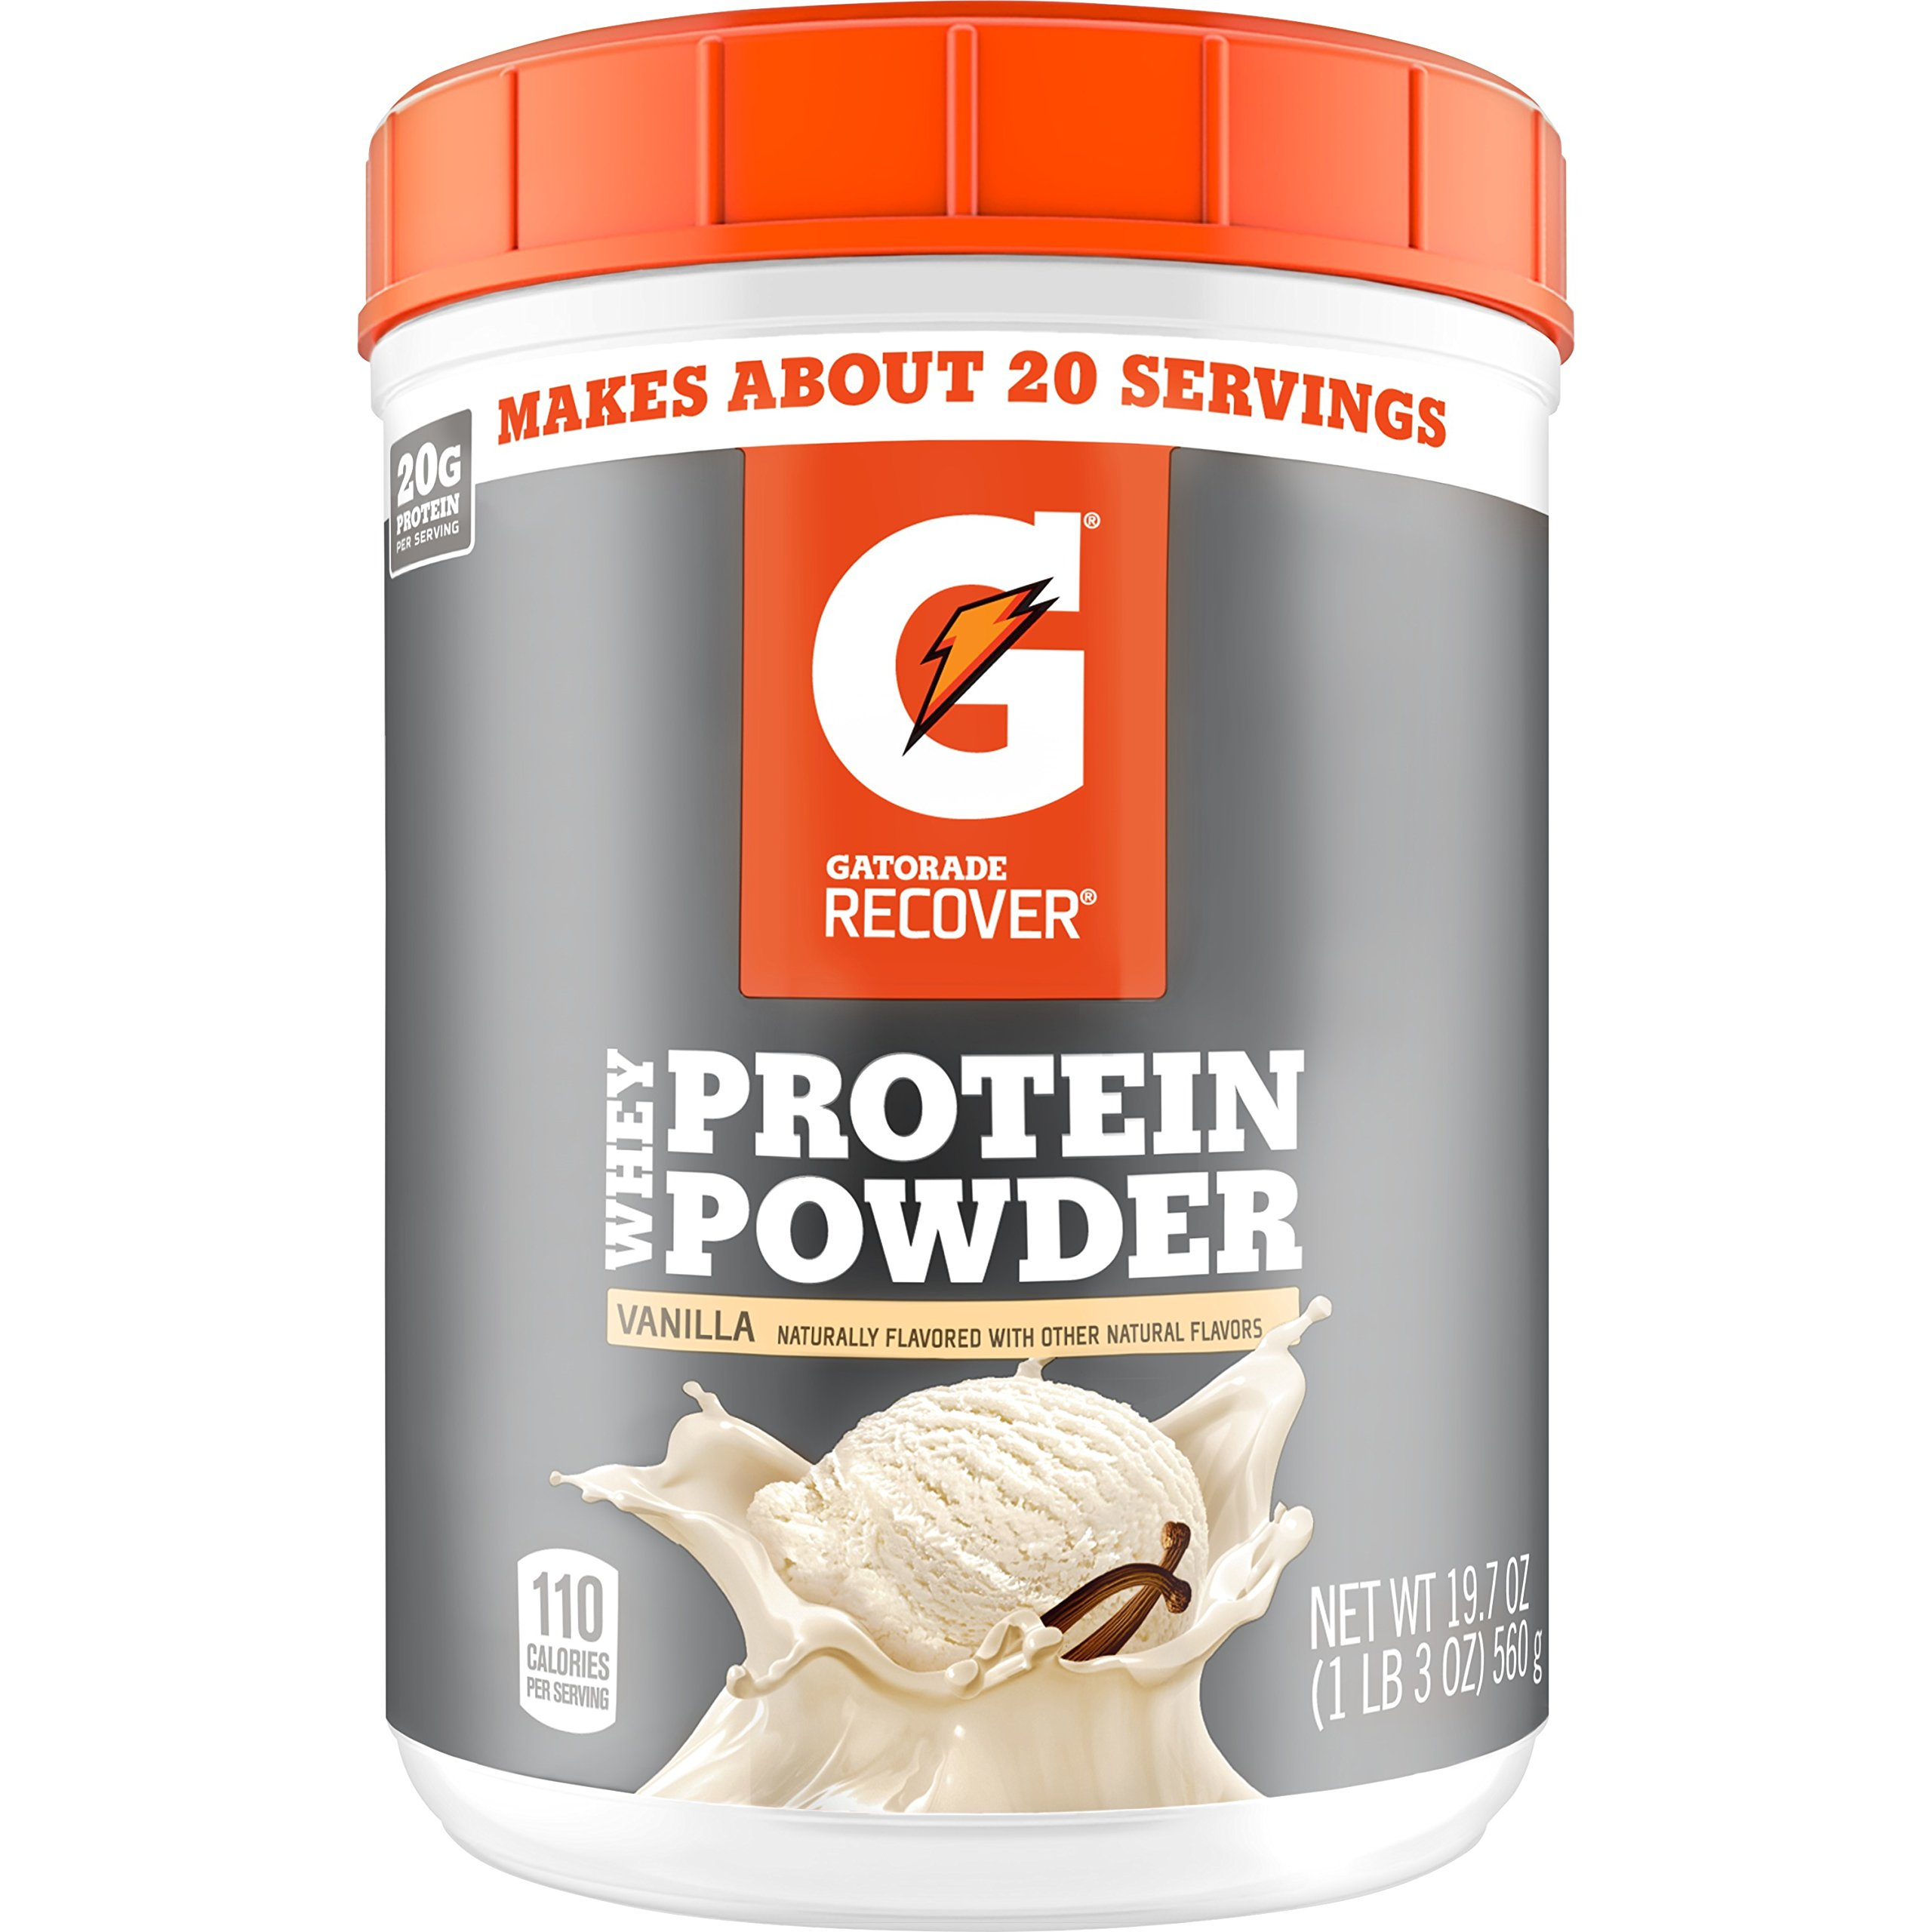 Gatorade Towels Amazon: Amazon.com : Gatorade Recover Whey Protein Powder, Vanilla